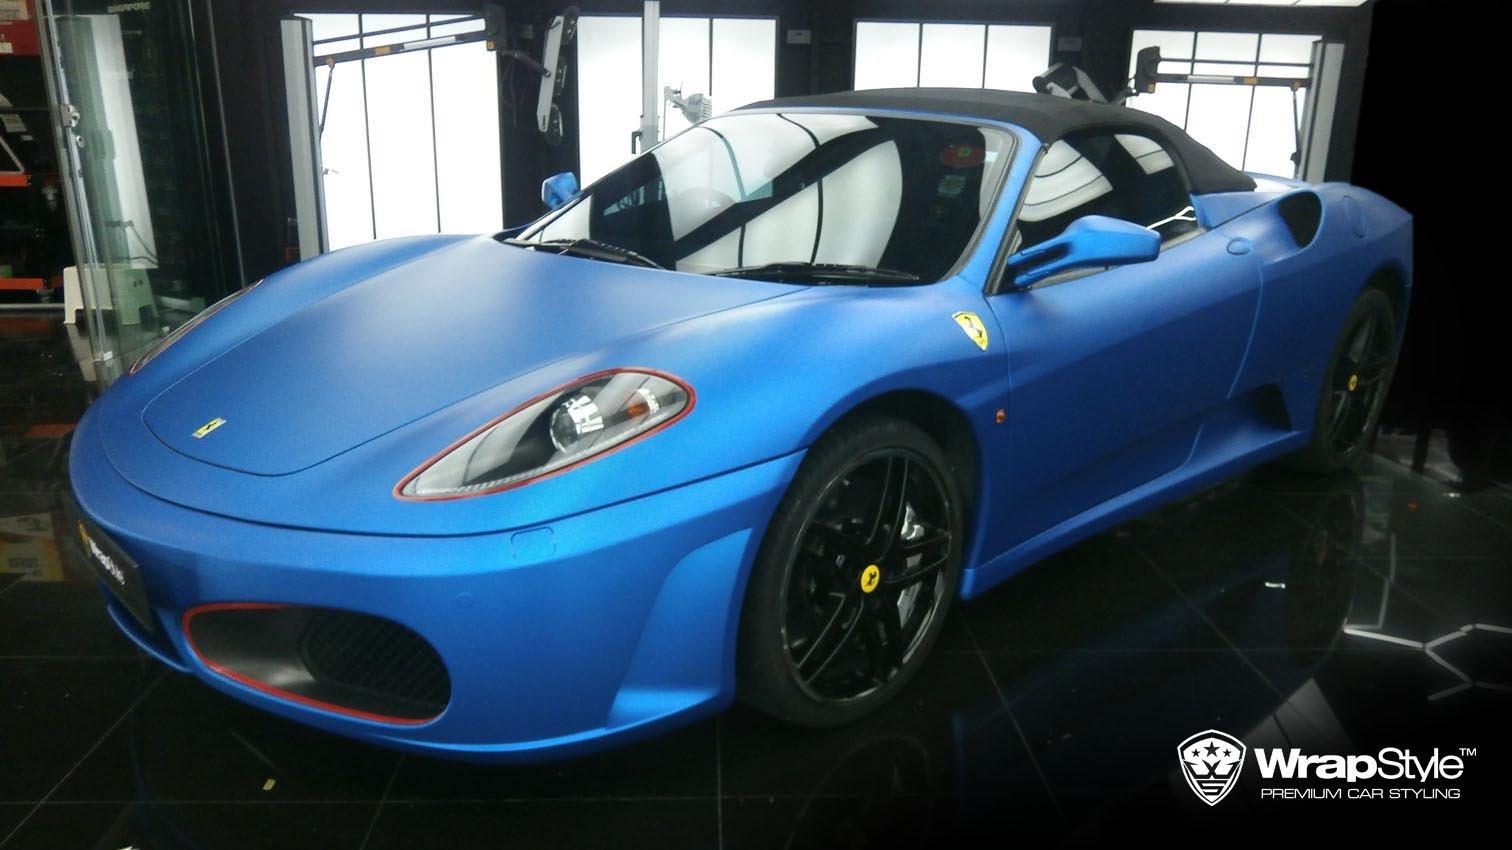 Ferrari F430 Blue Matt Metalic Wrap Wrapstyle